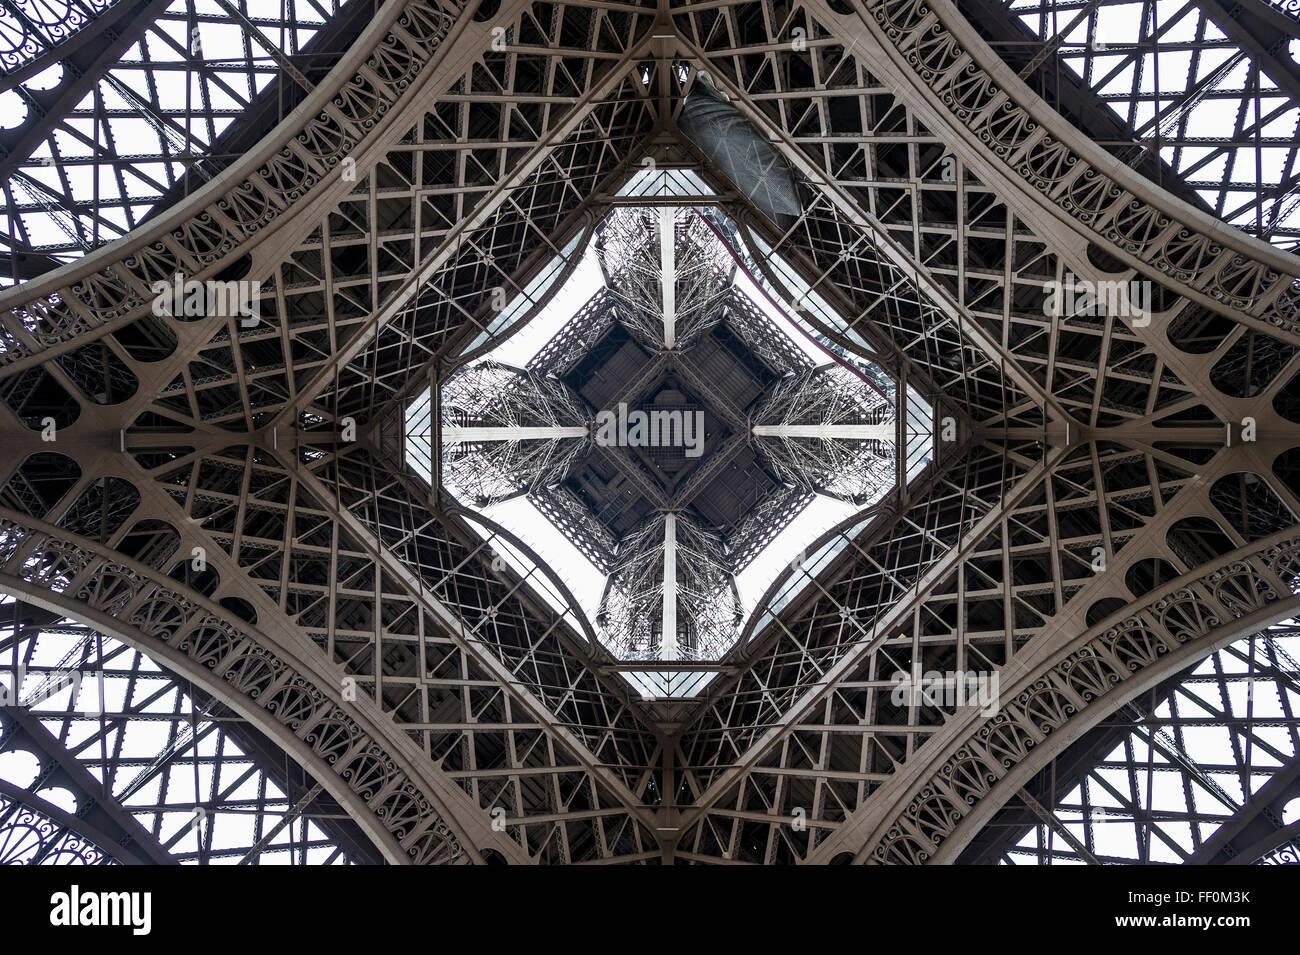 Eiffel Tower, seen from beneath, Paris, Ile-de-France, France - Stock Image